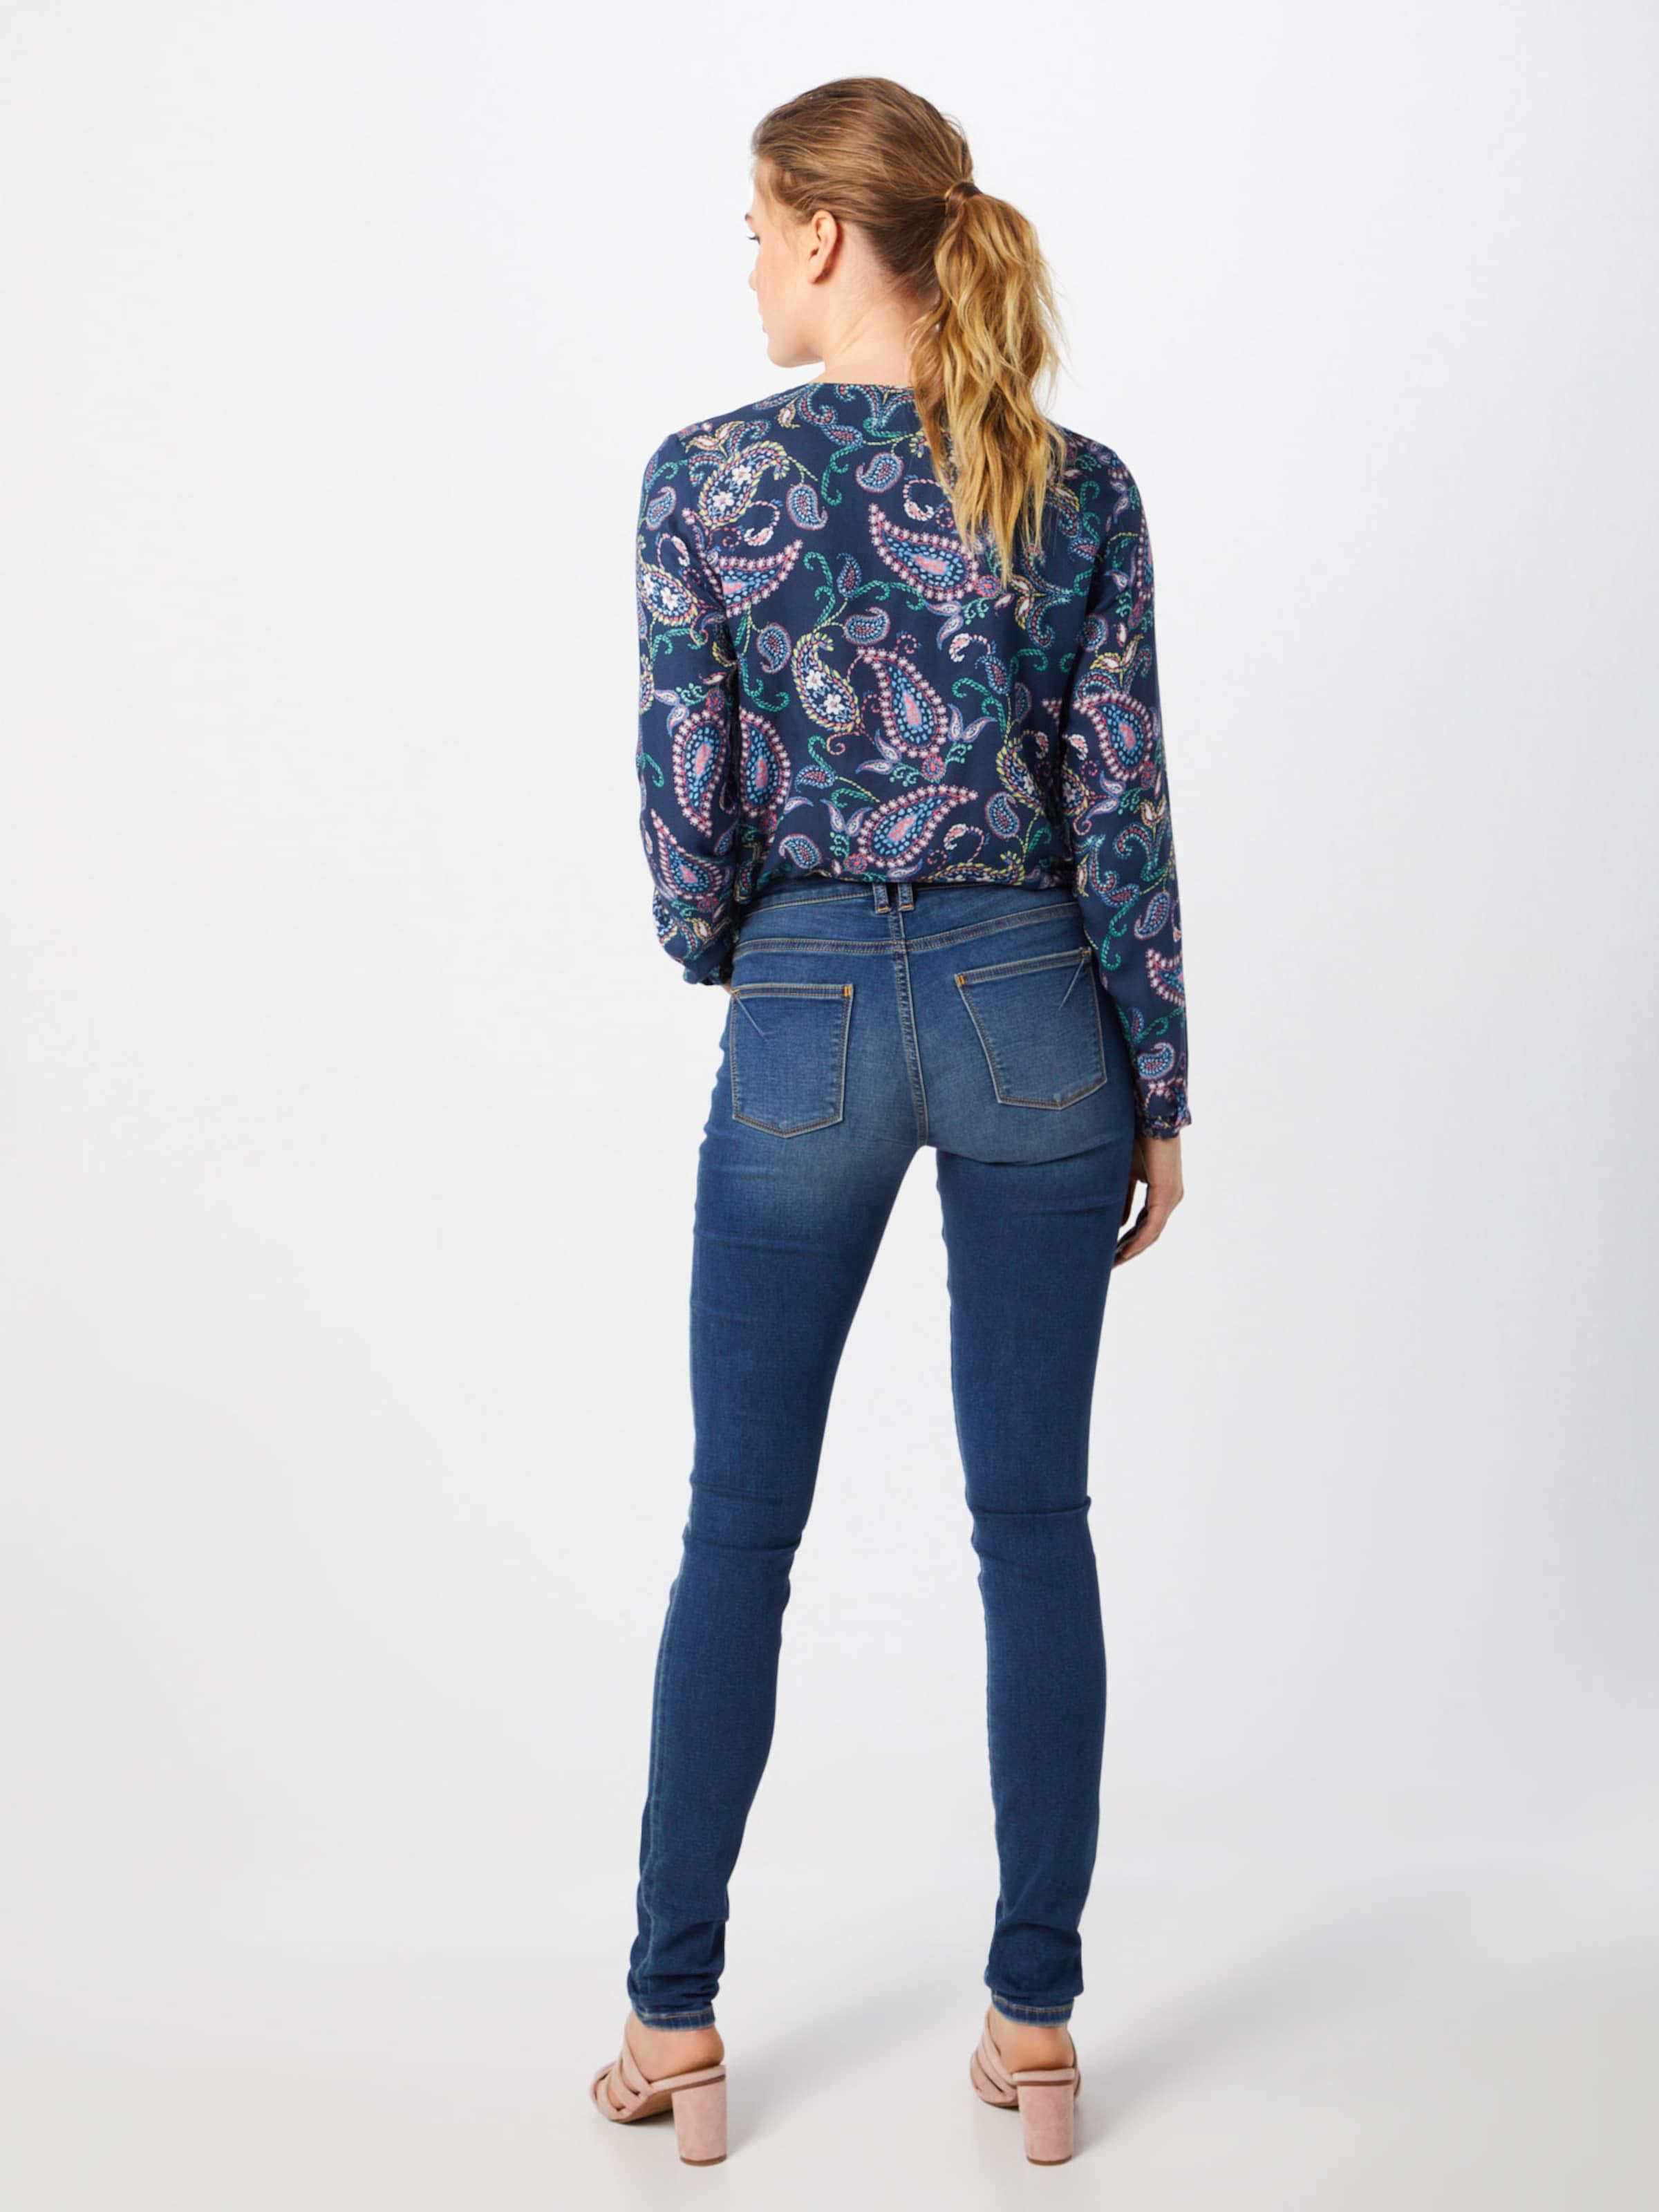 En Denim 'pants Esprit Jean Bleu Denim' JcT15uF3lK